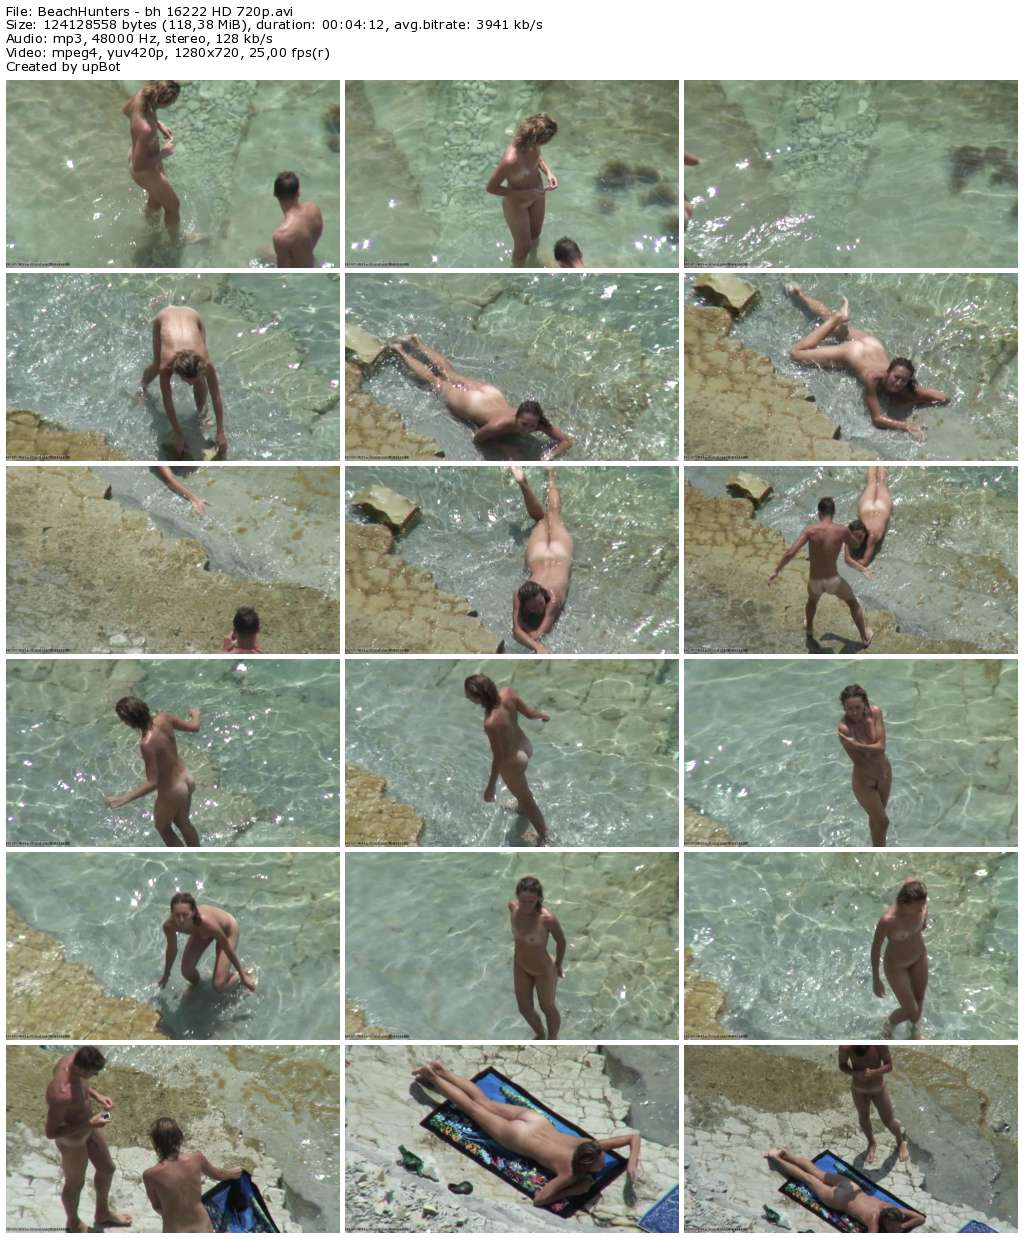 BeachHunters_-_bh_16222_HD_720p_thumb.jpg